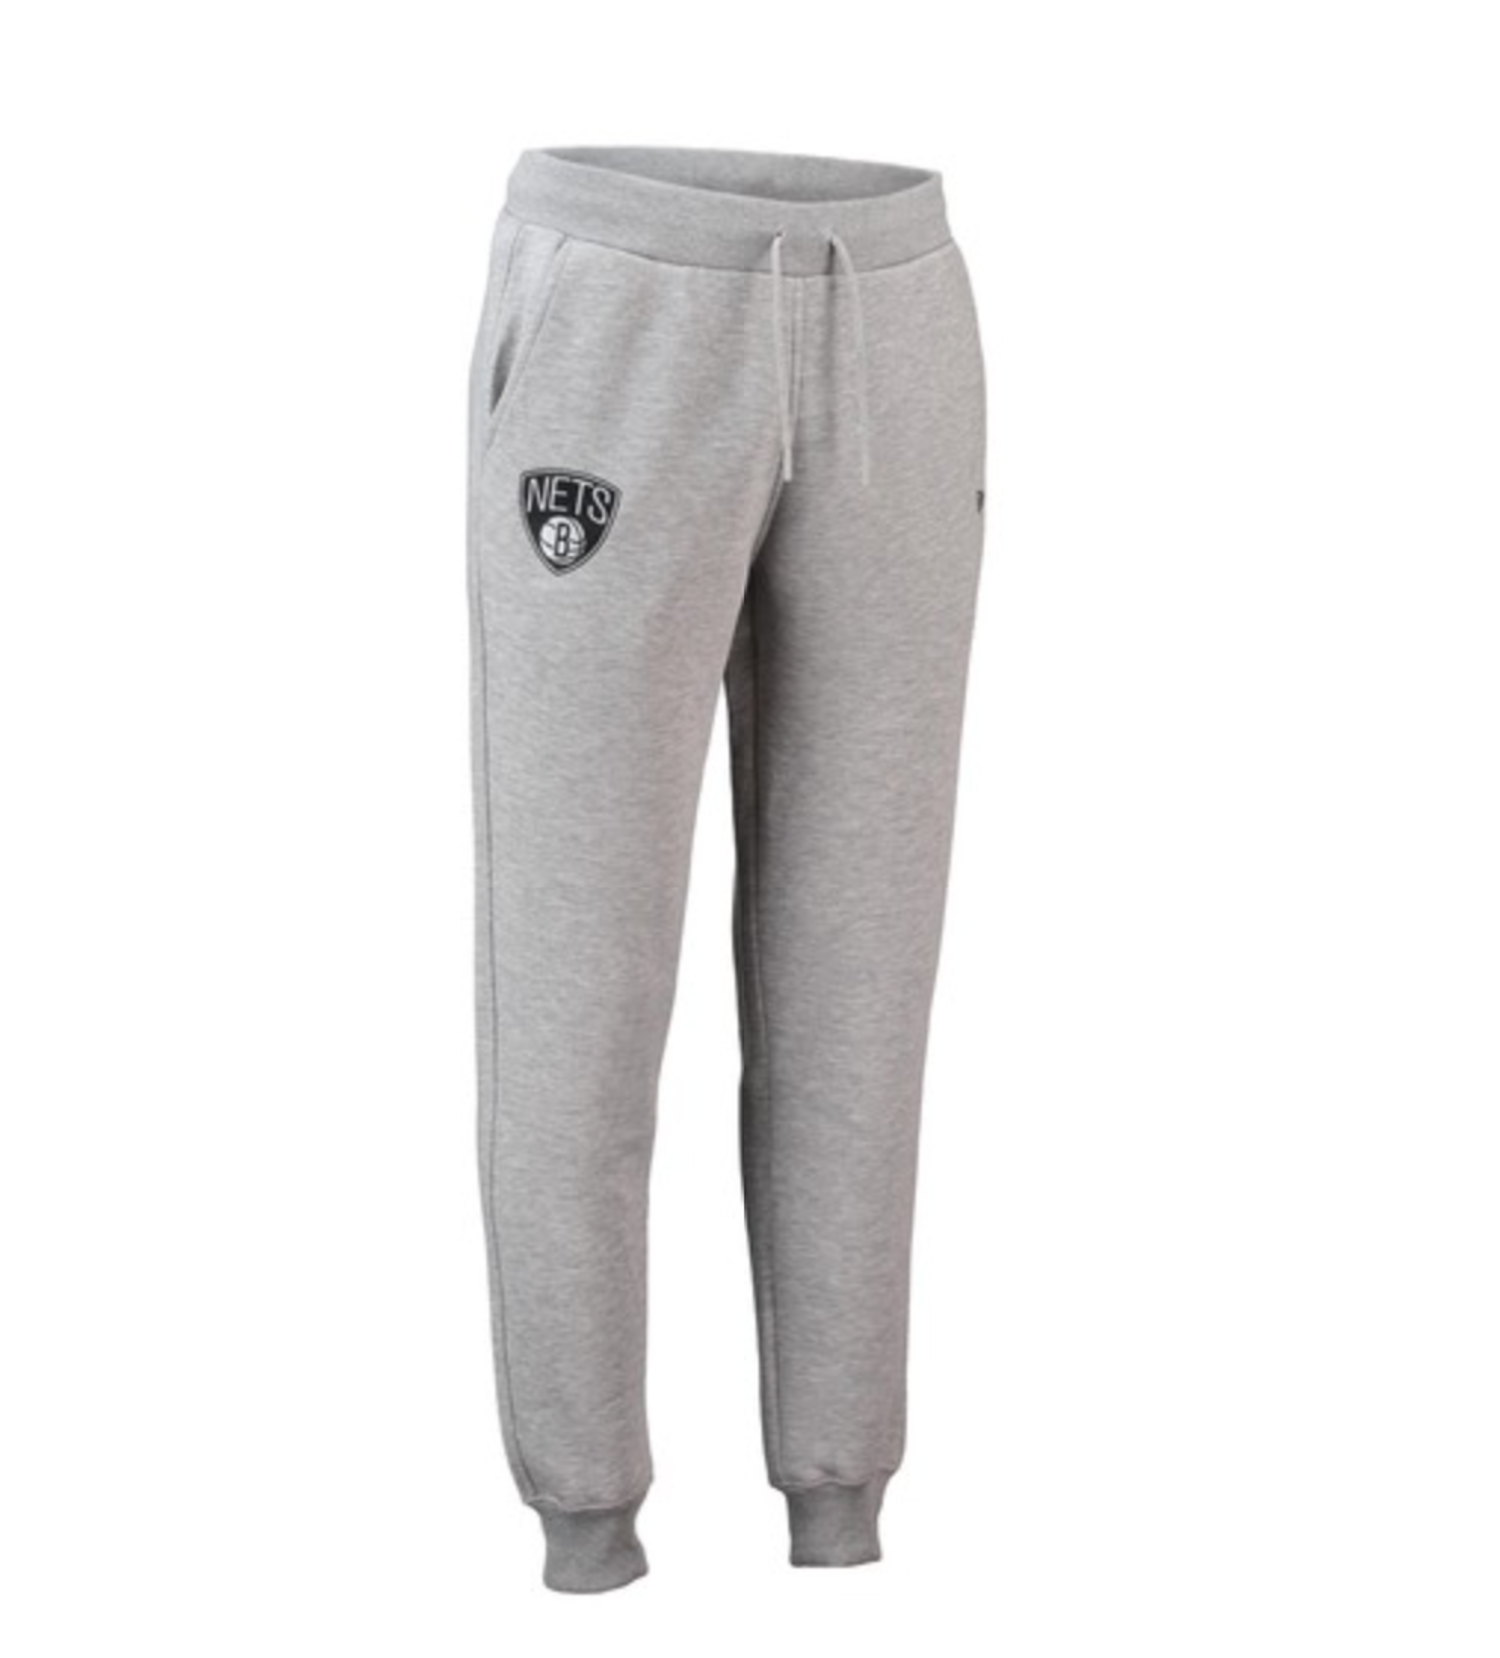 Pantalón de chandal de Brooklyn Nets para la temporada 2018/19